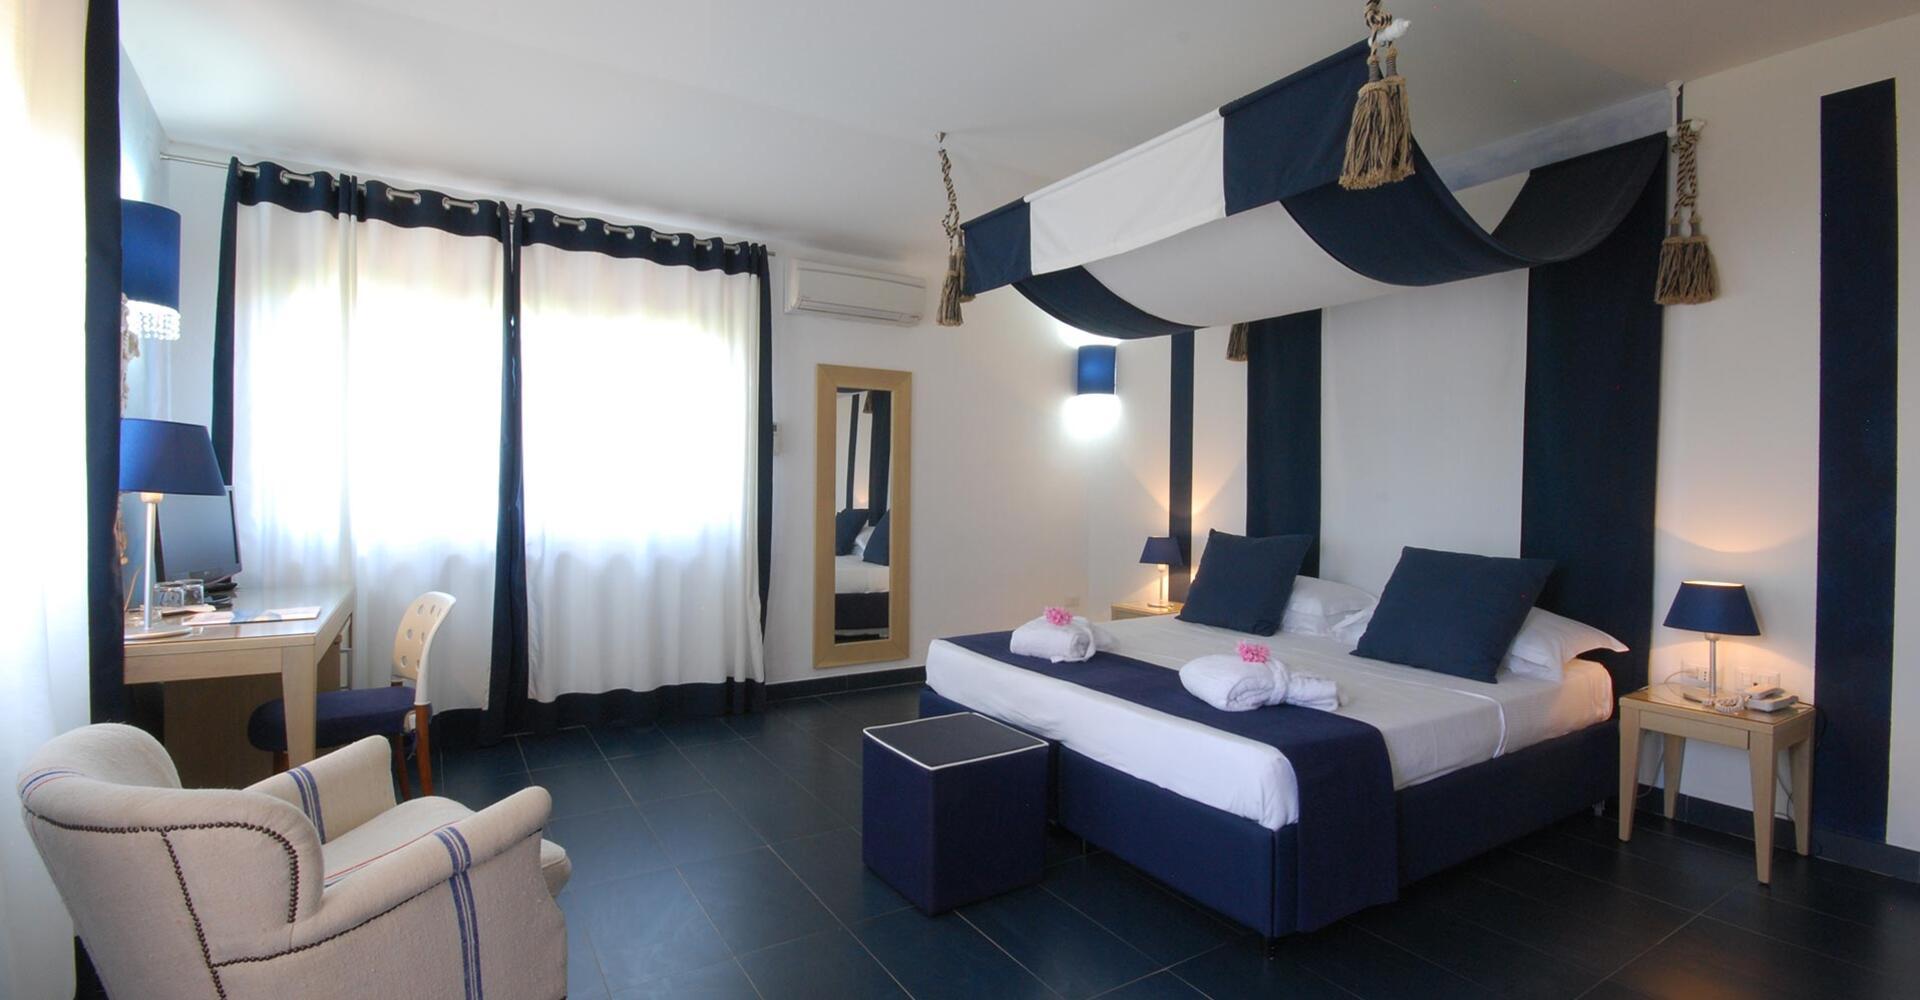 hotelcalarosa it home 019